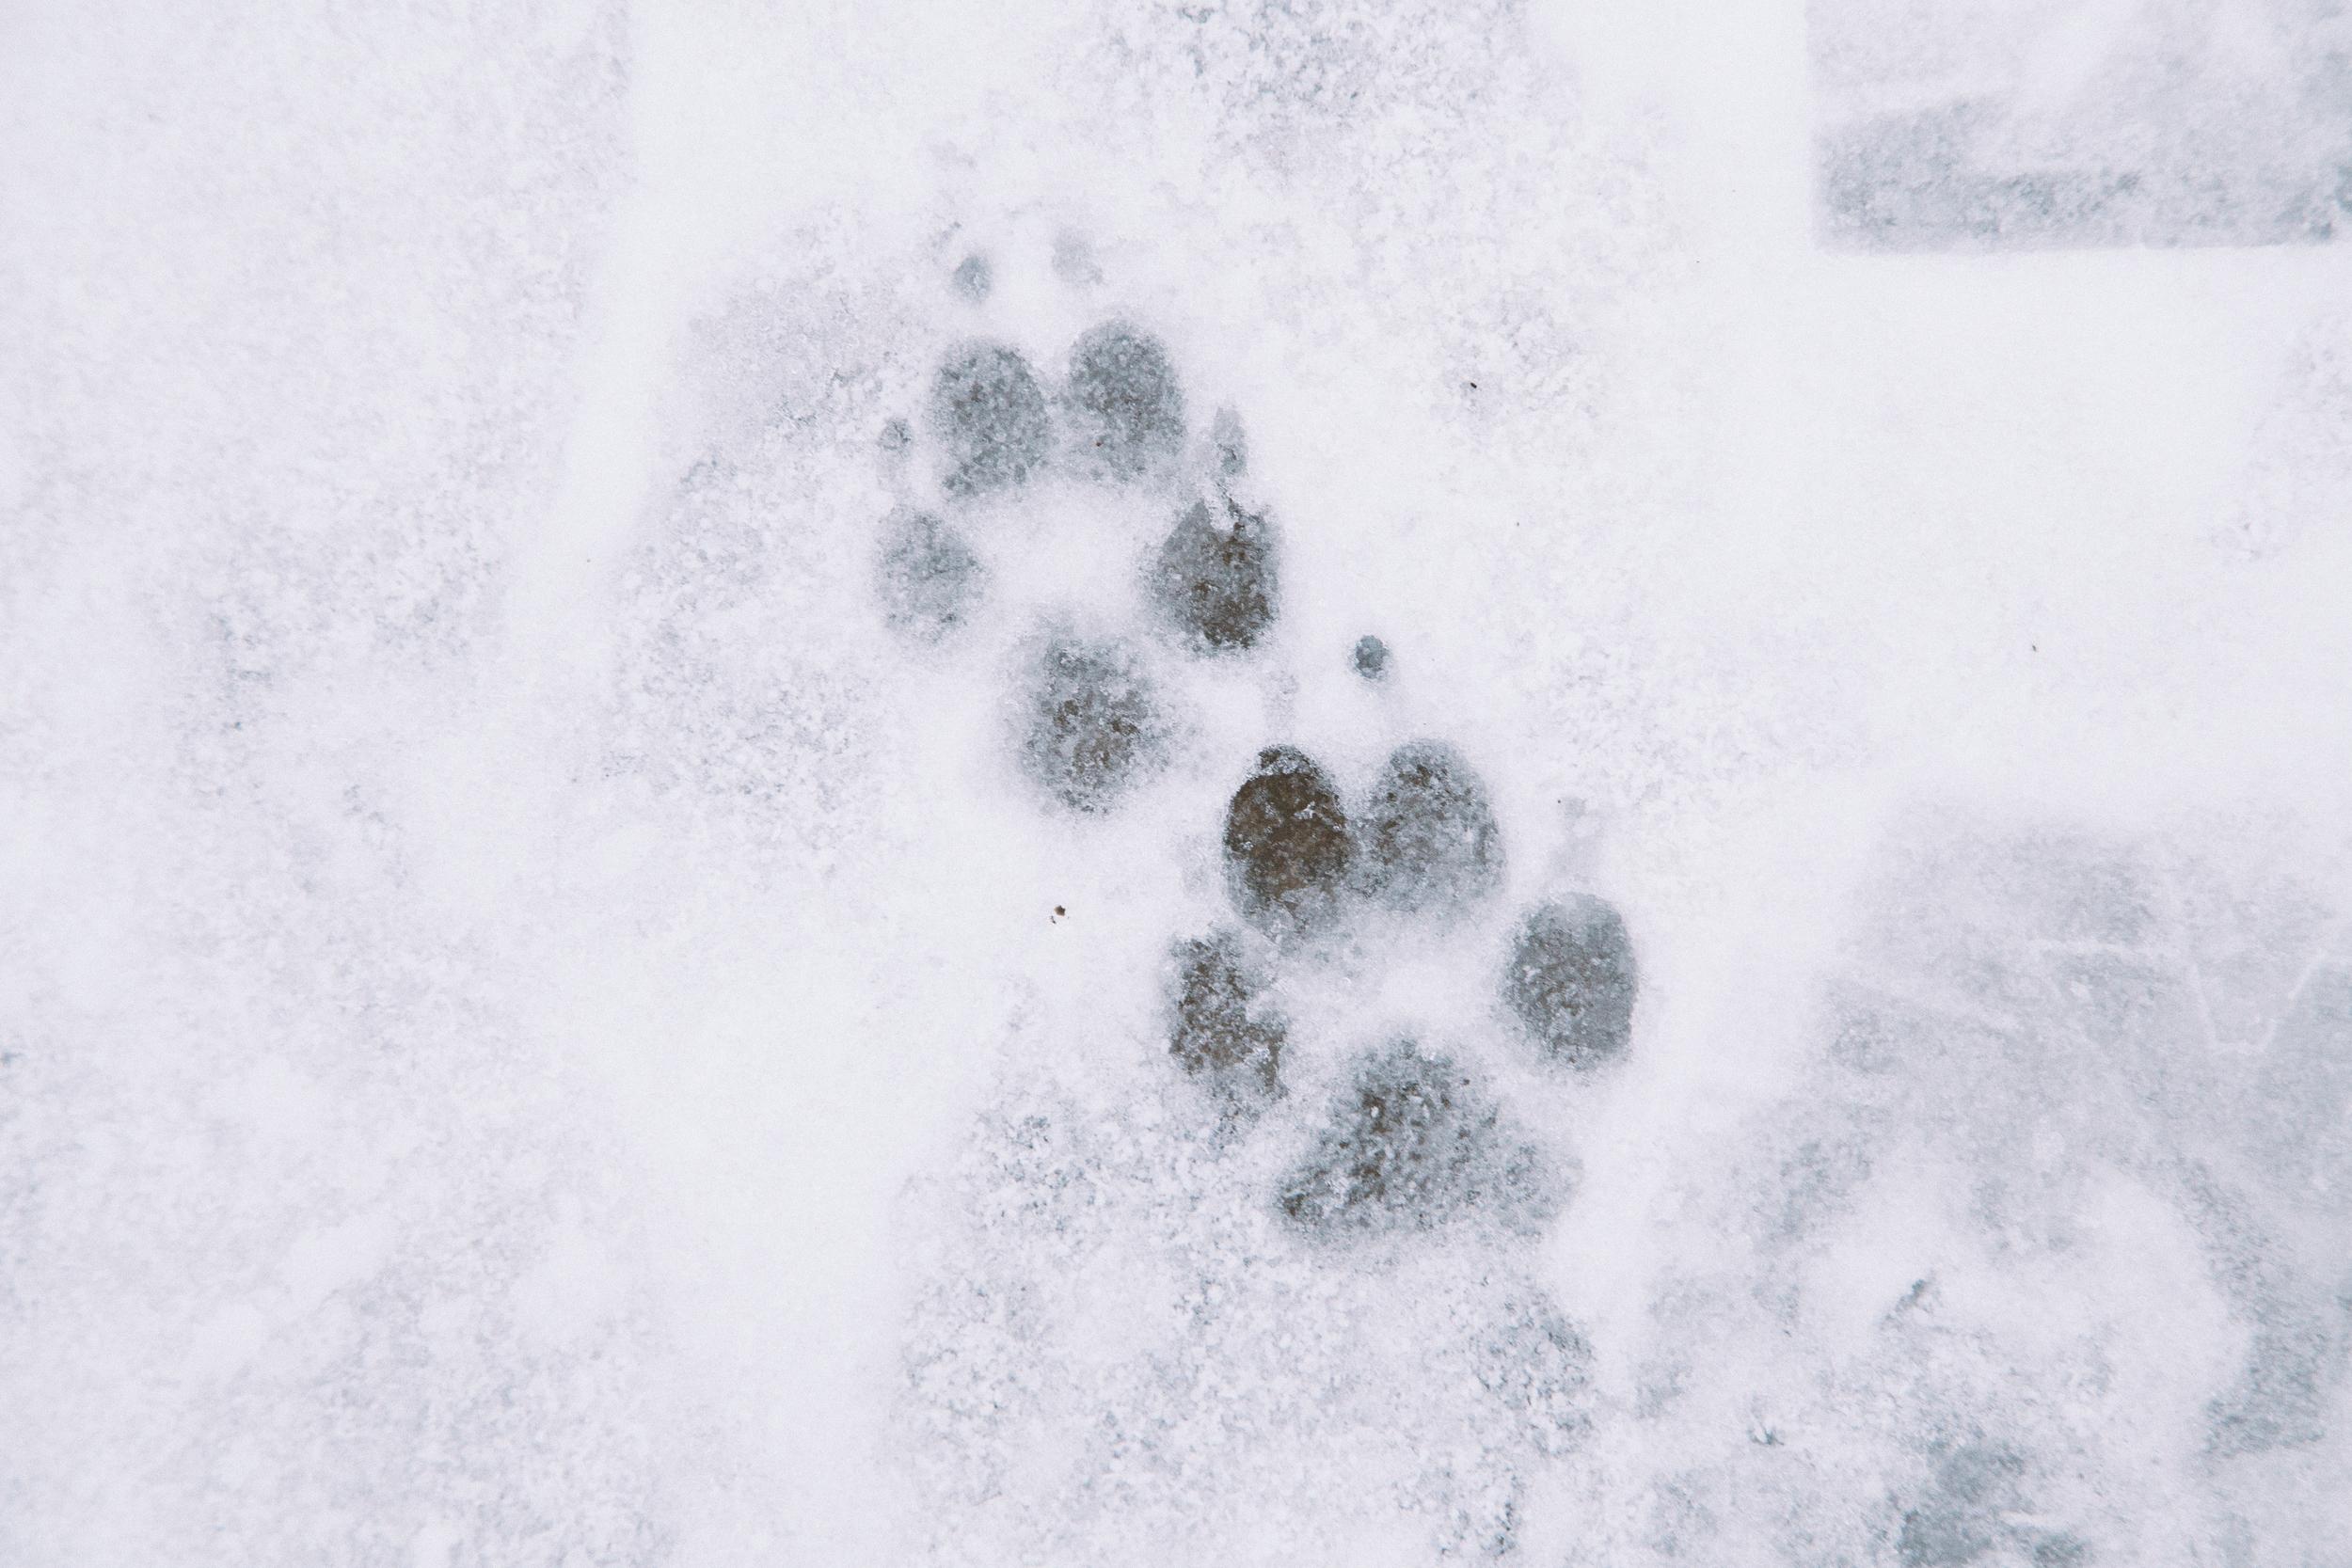 25 // 365 Puppy paws